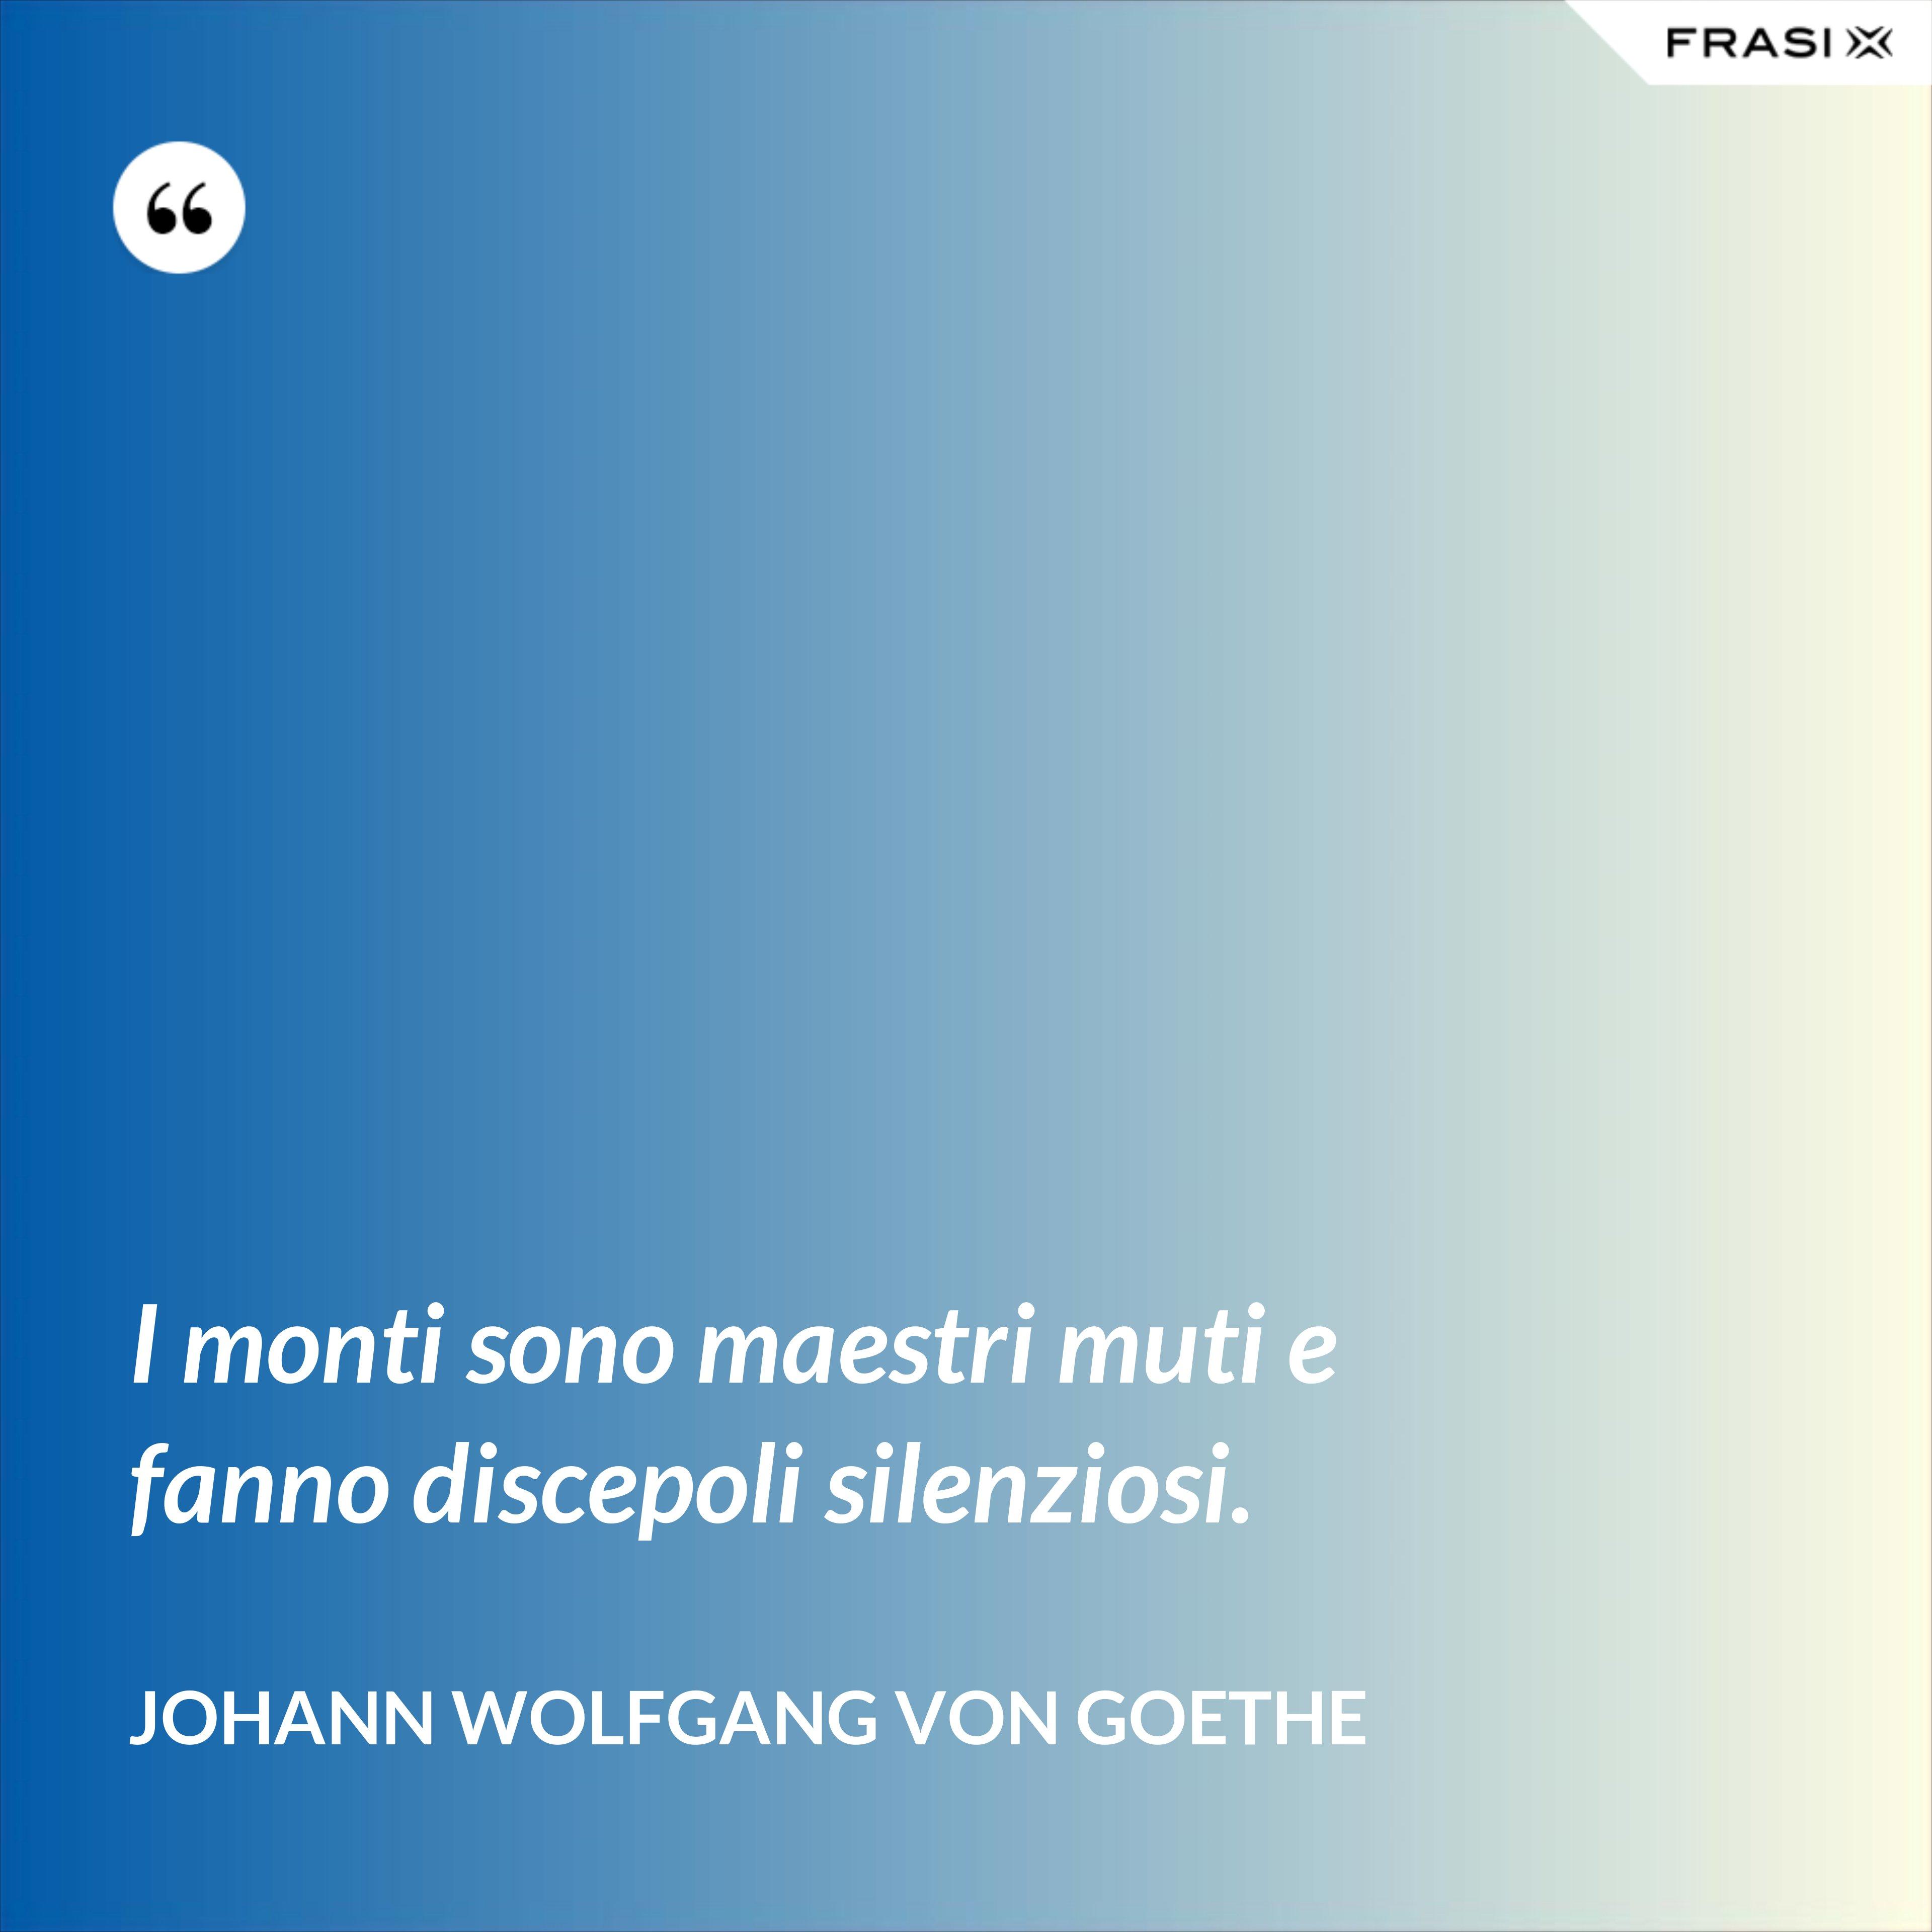 I monti sono maestri muti e fanno discepoli silenziosi. - Johann Wolfgang von Goethe